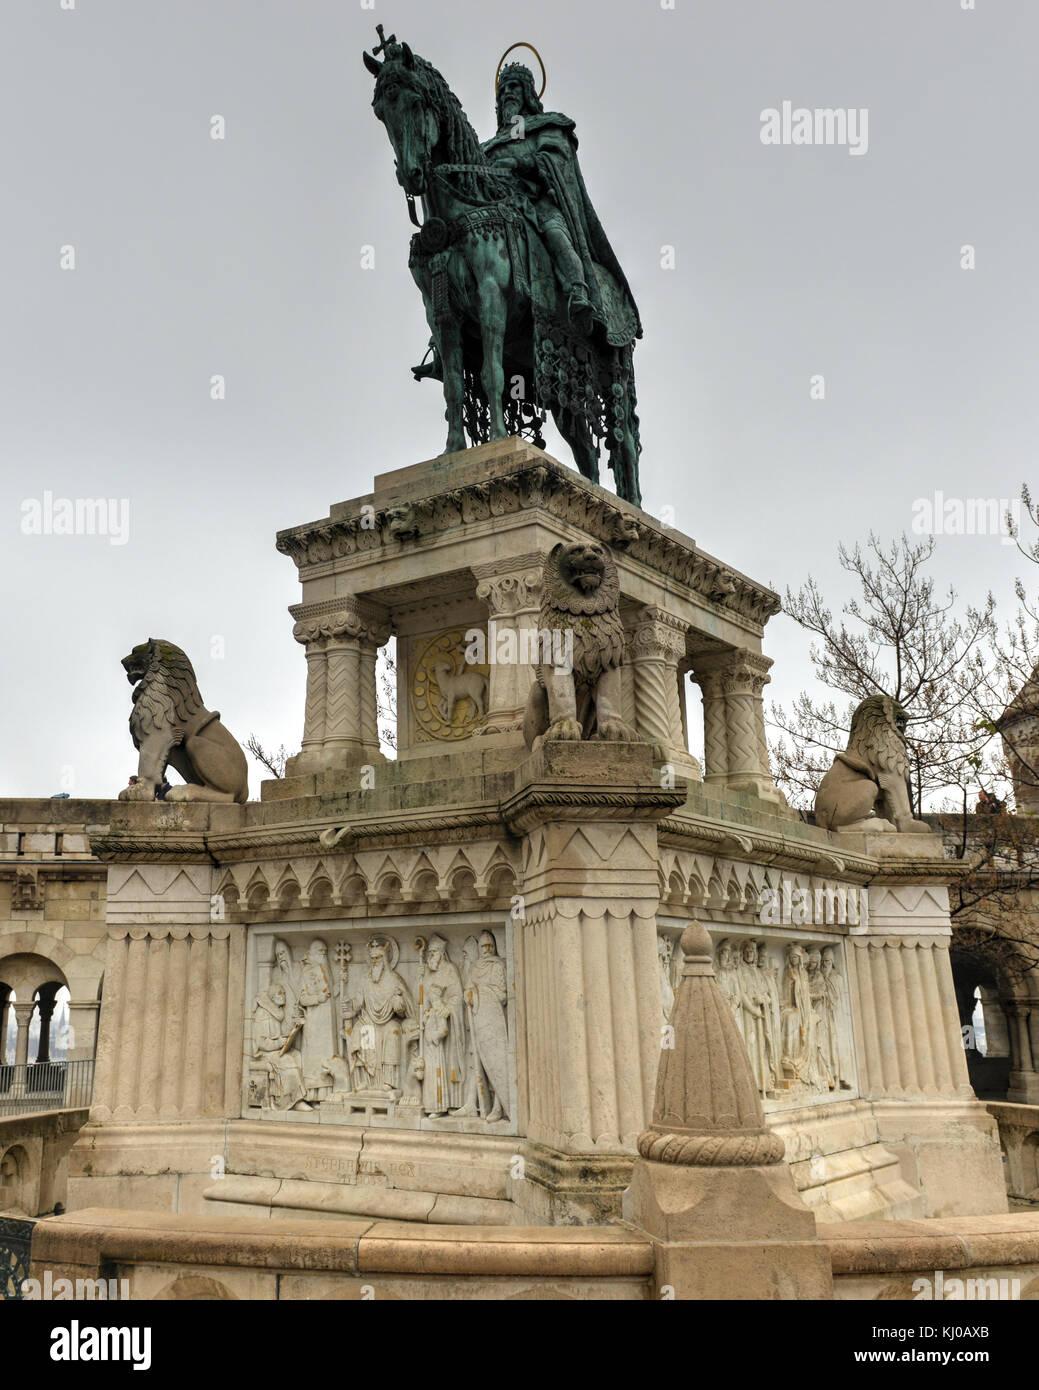 Stephen (Istvan) I Monument at Fisherman's Bastion in Budapest, Hungary - Stock Image